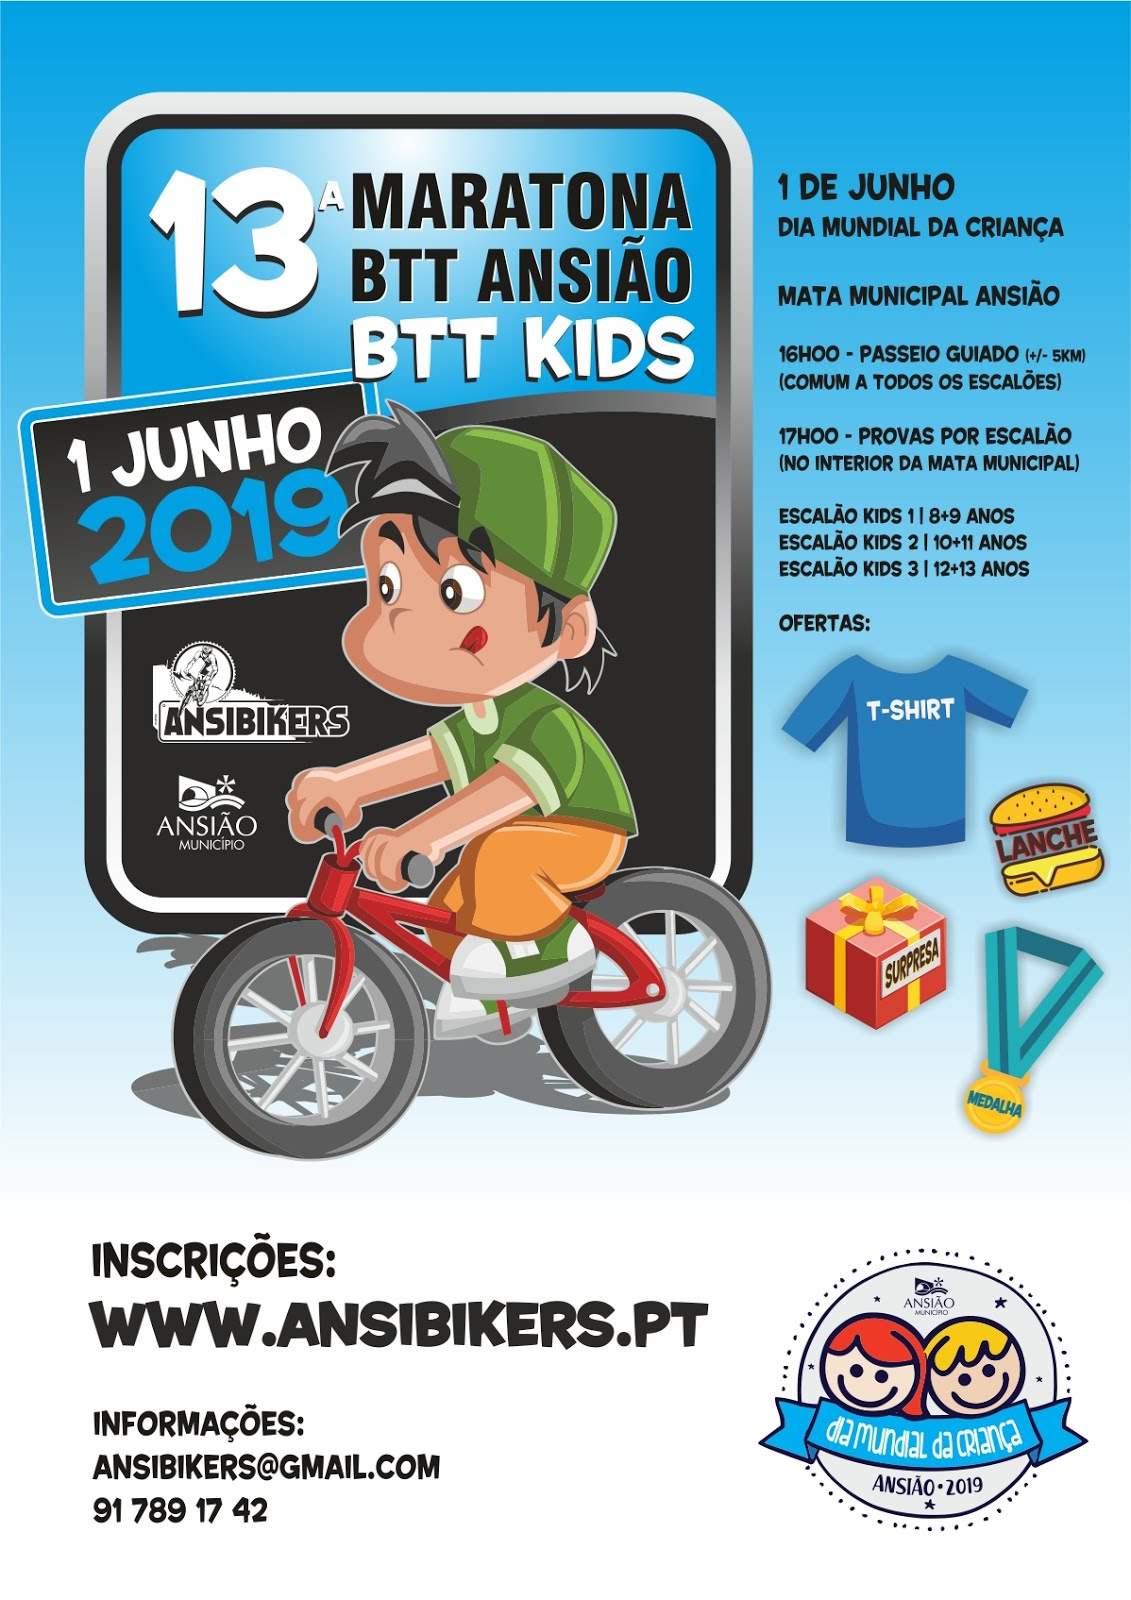 13ª Maratona BTT de Ansião - BTTKIDS